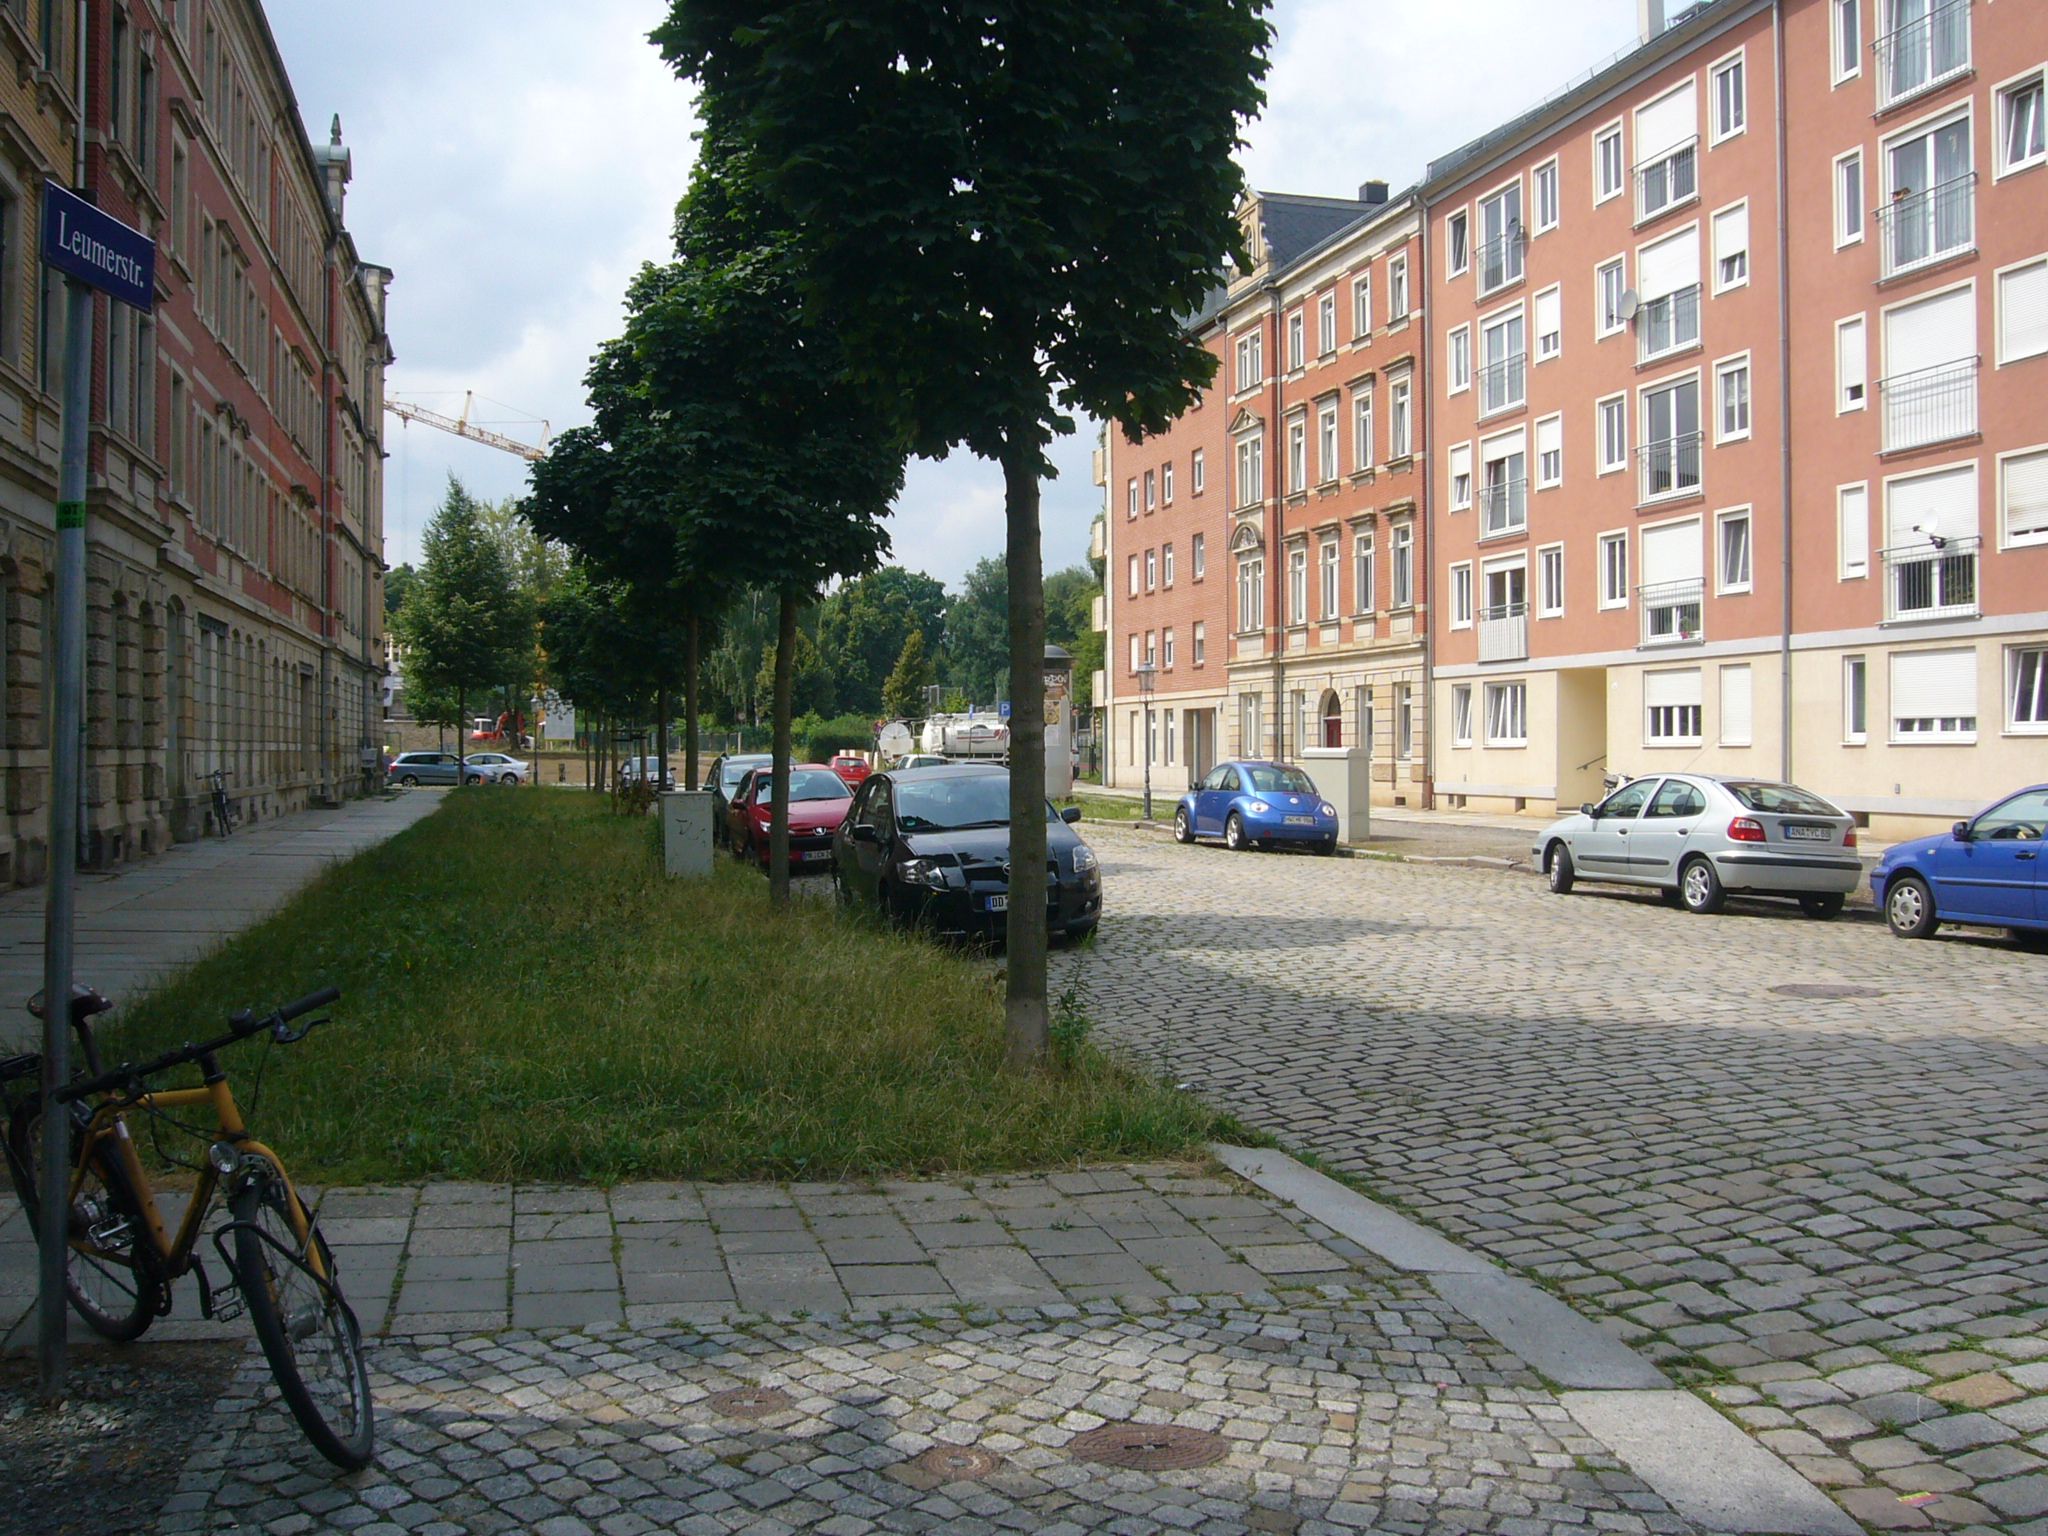 Blick in die Leumerstraße